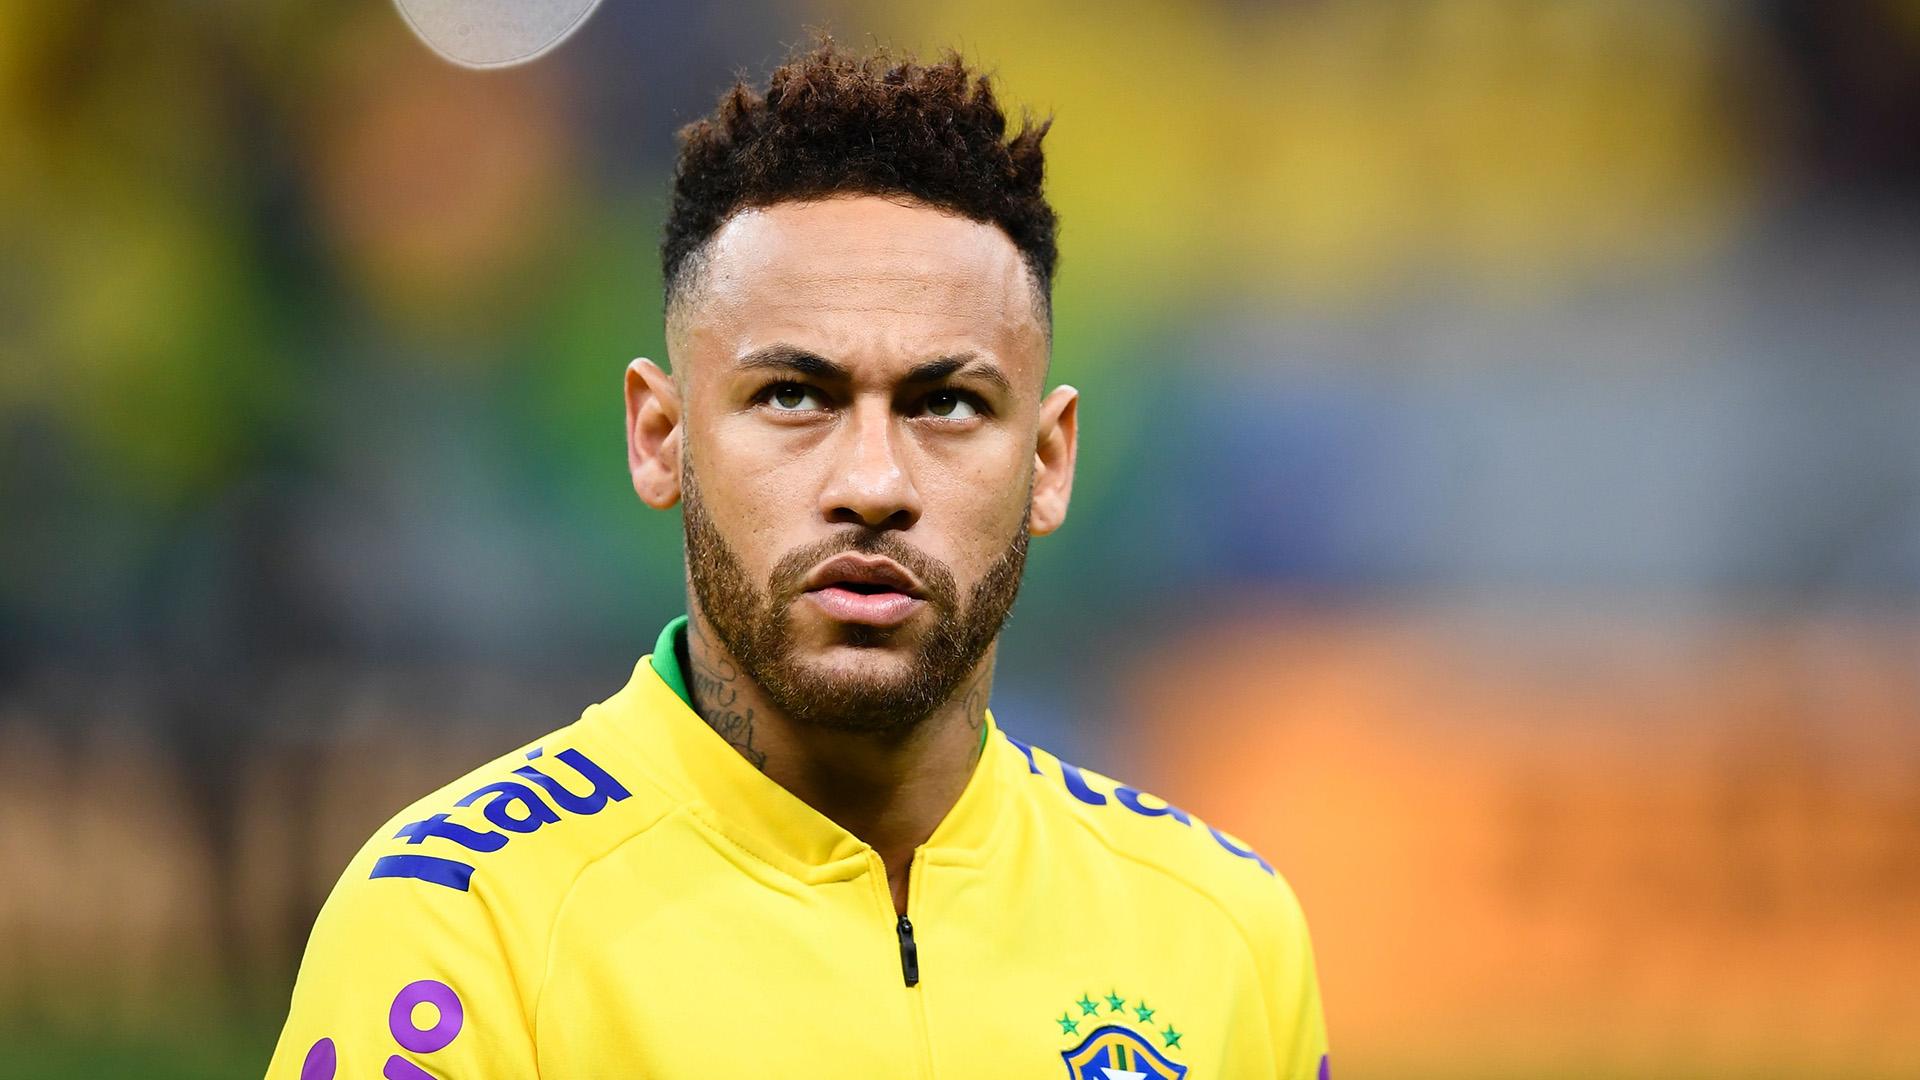 Tearful Neymar taken off with injury in Brazil's pre-Copa America friendly with Qatar